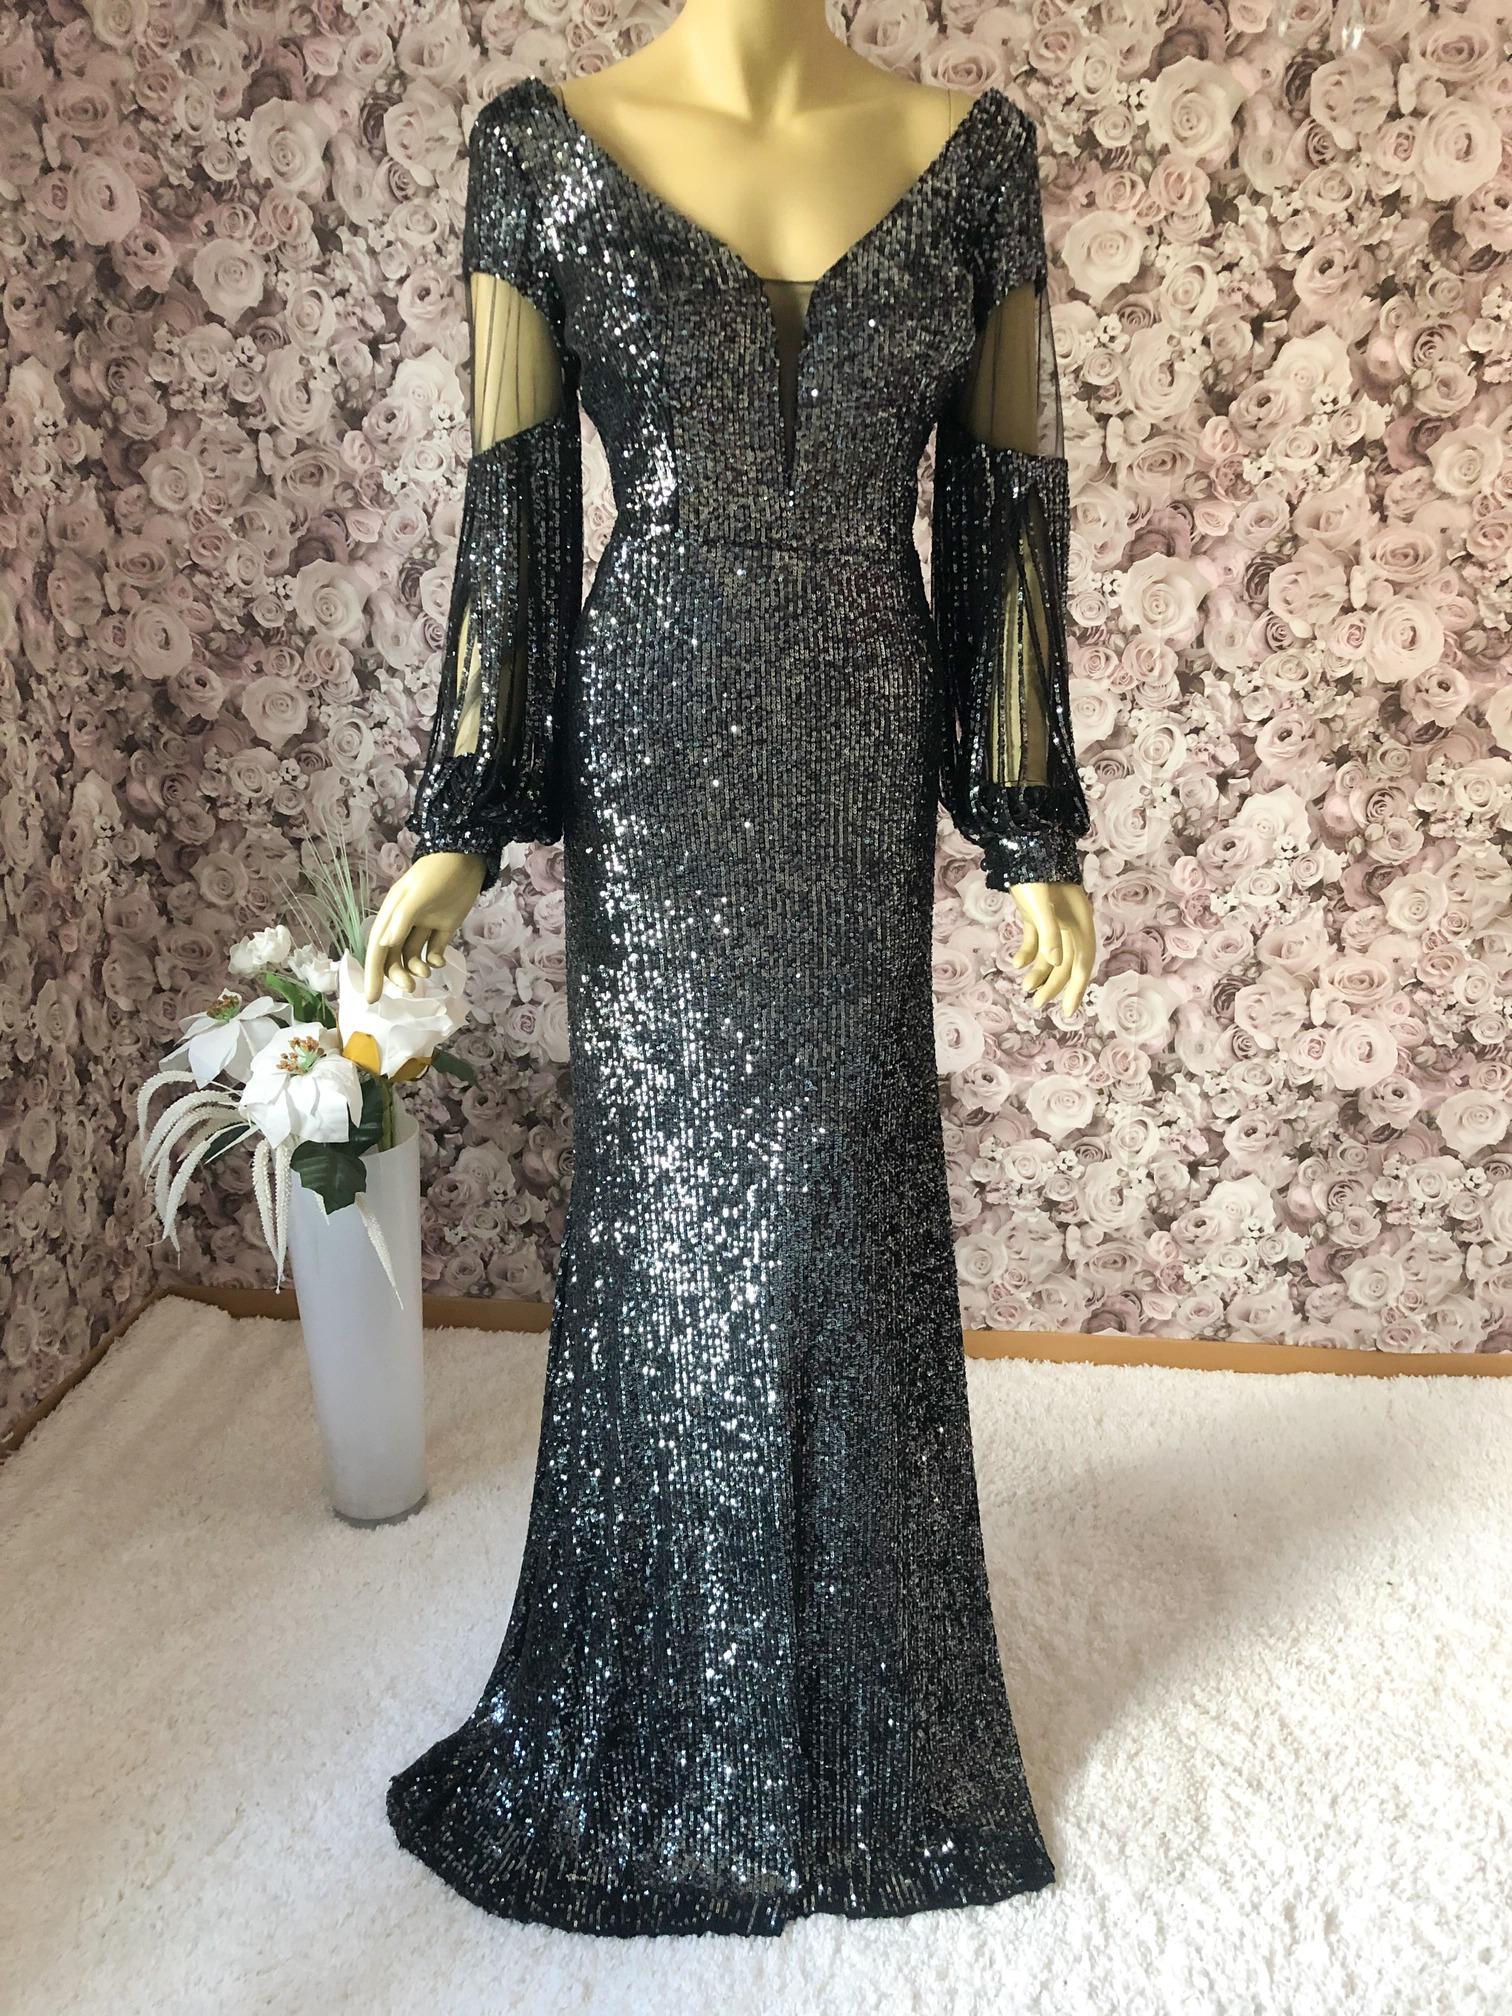 Elegantes Pailletten-Kleid schwarz✔ Multicolor✔ Highlight 12✔